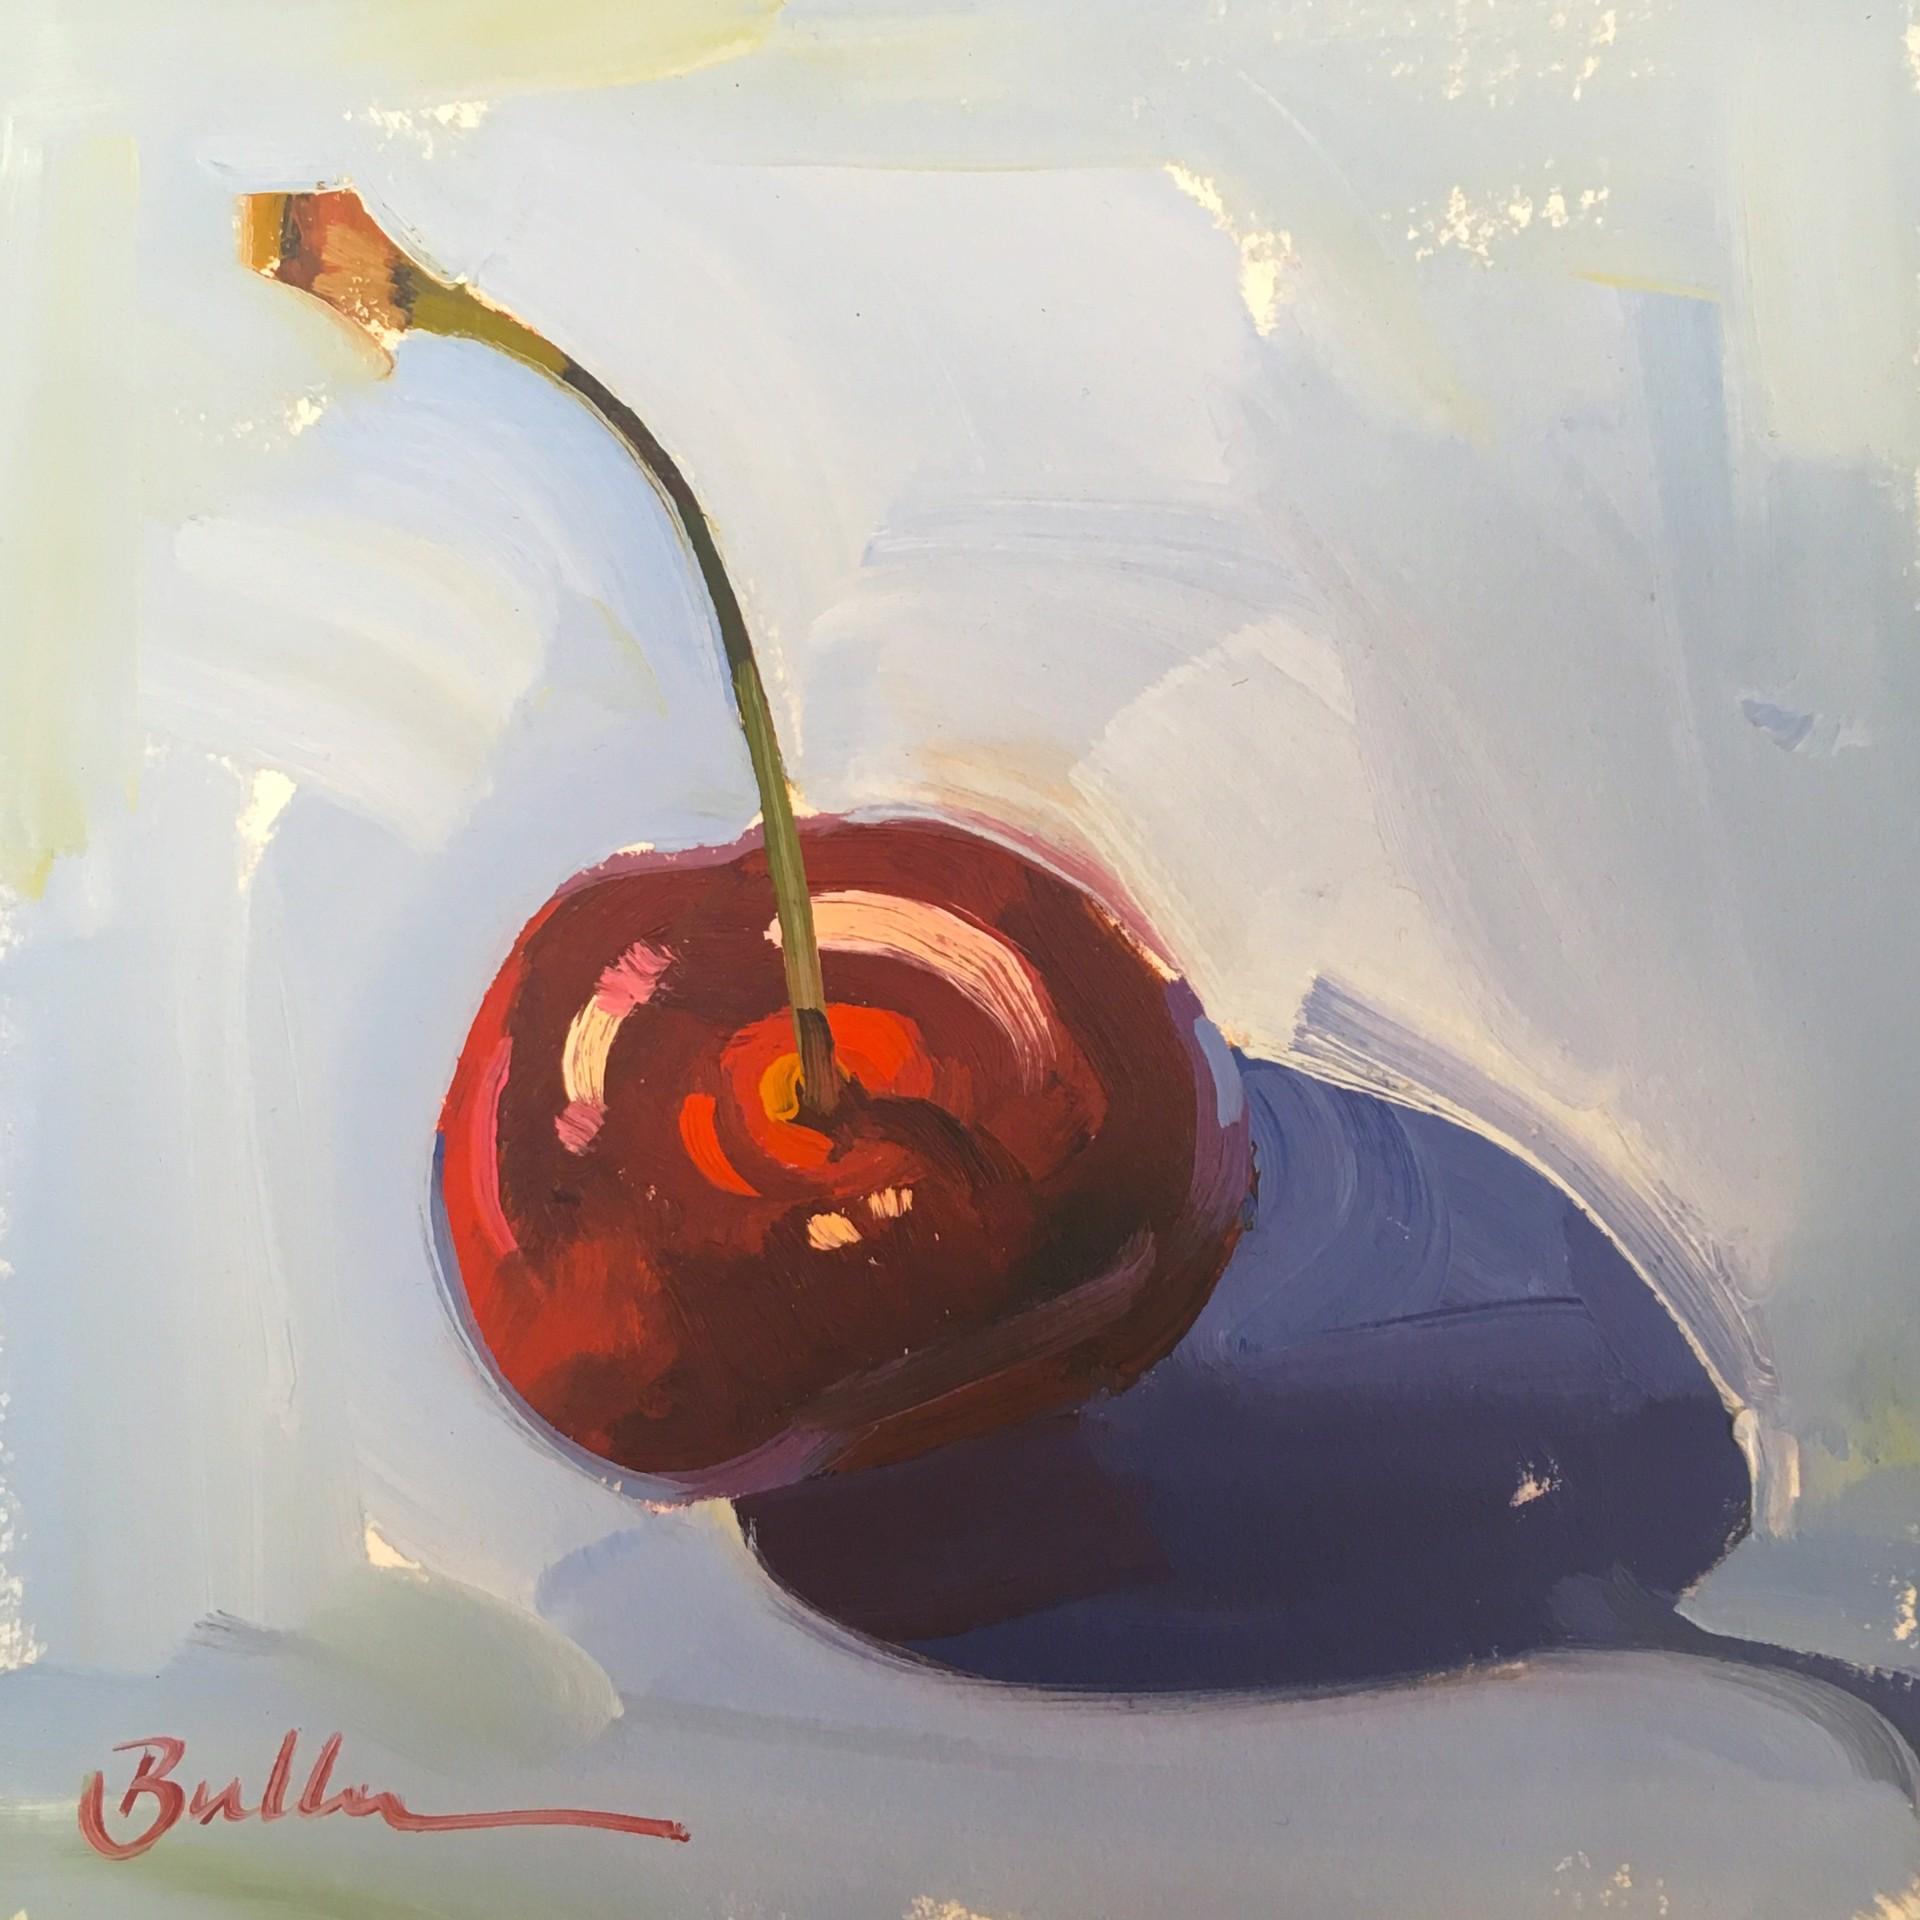 Tart Cherry by Samantha Buller